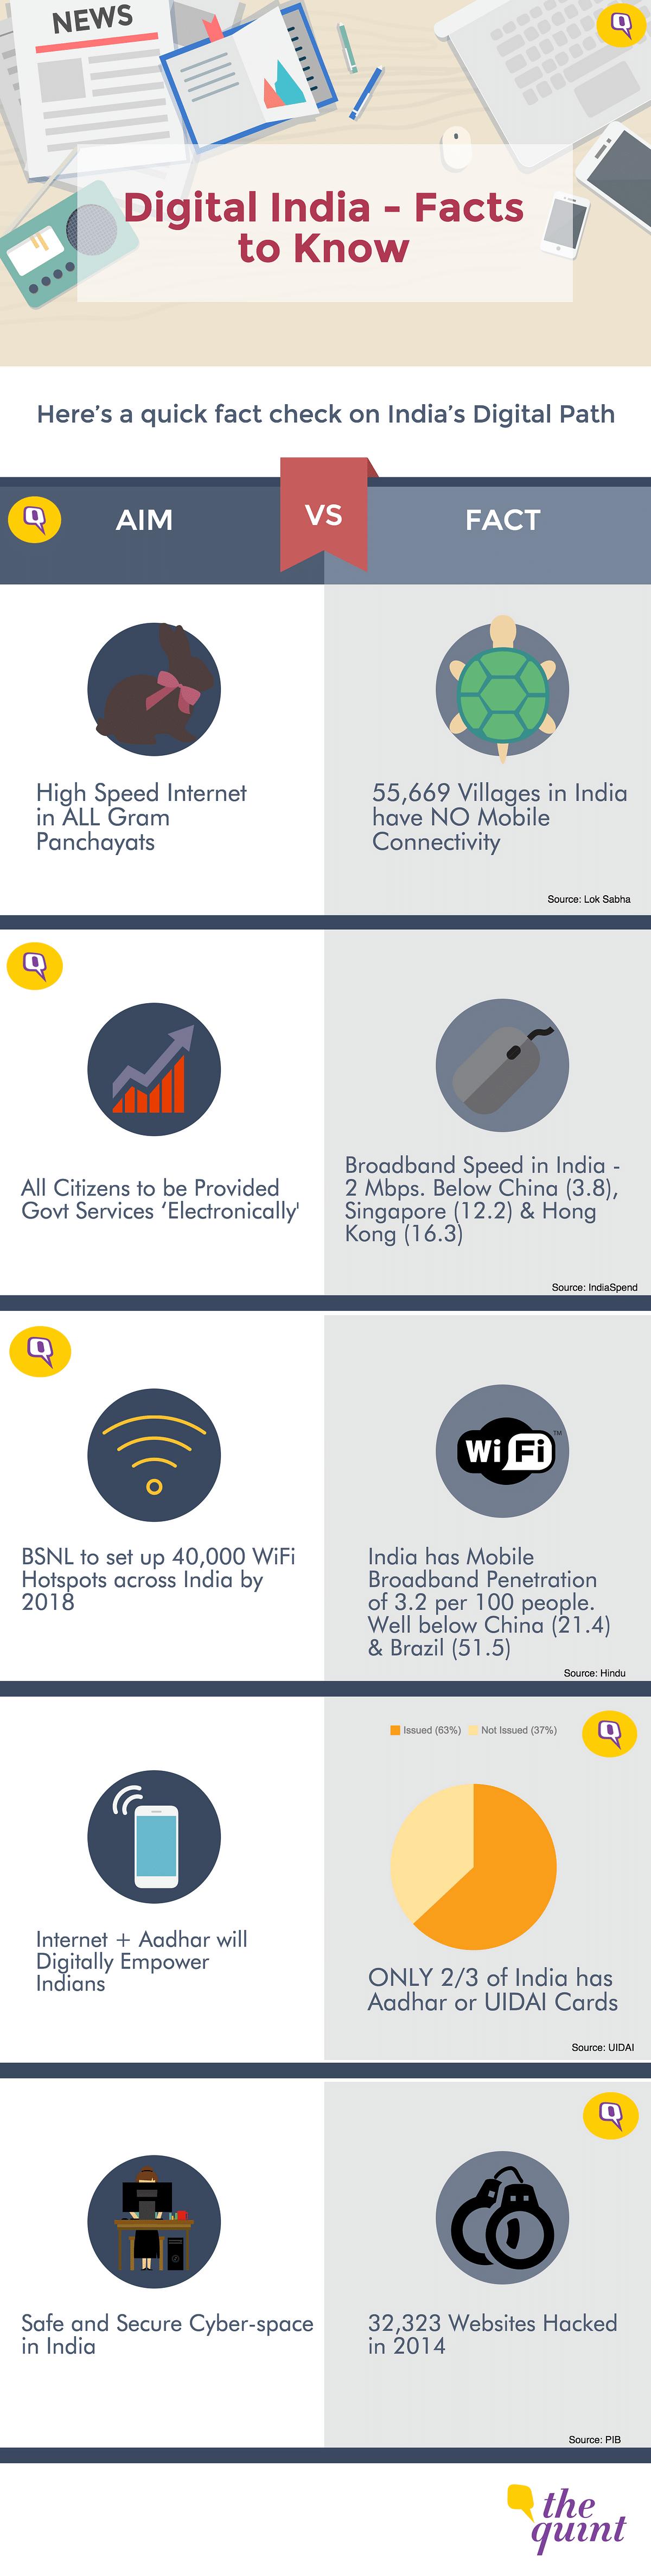 #FactCheck: Digital India Has a Long Way to Go